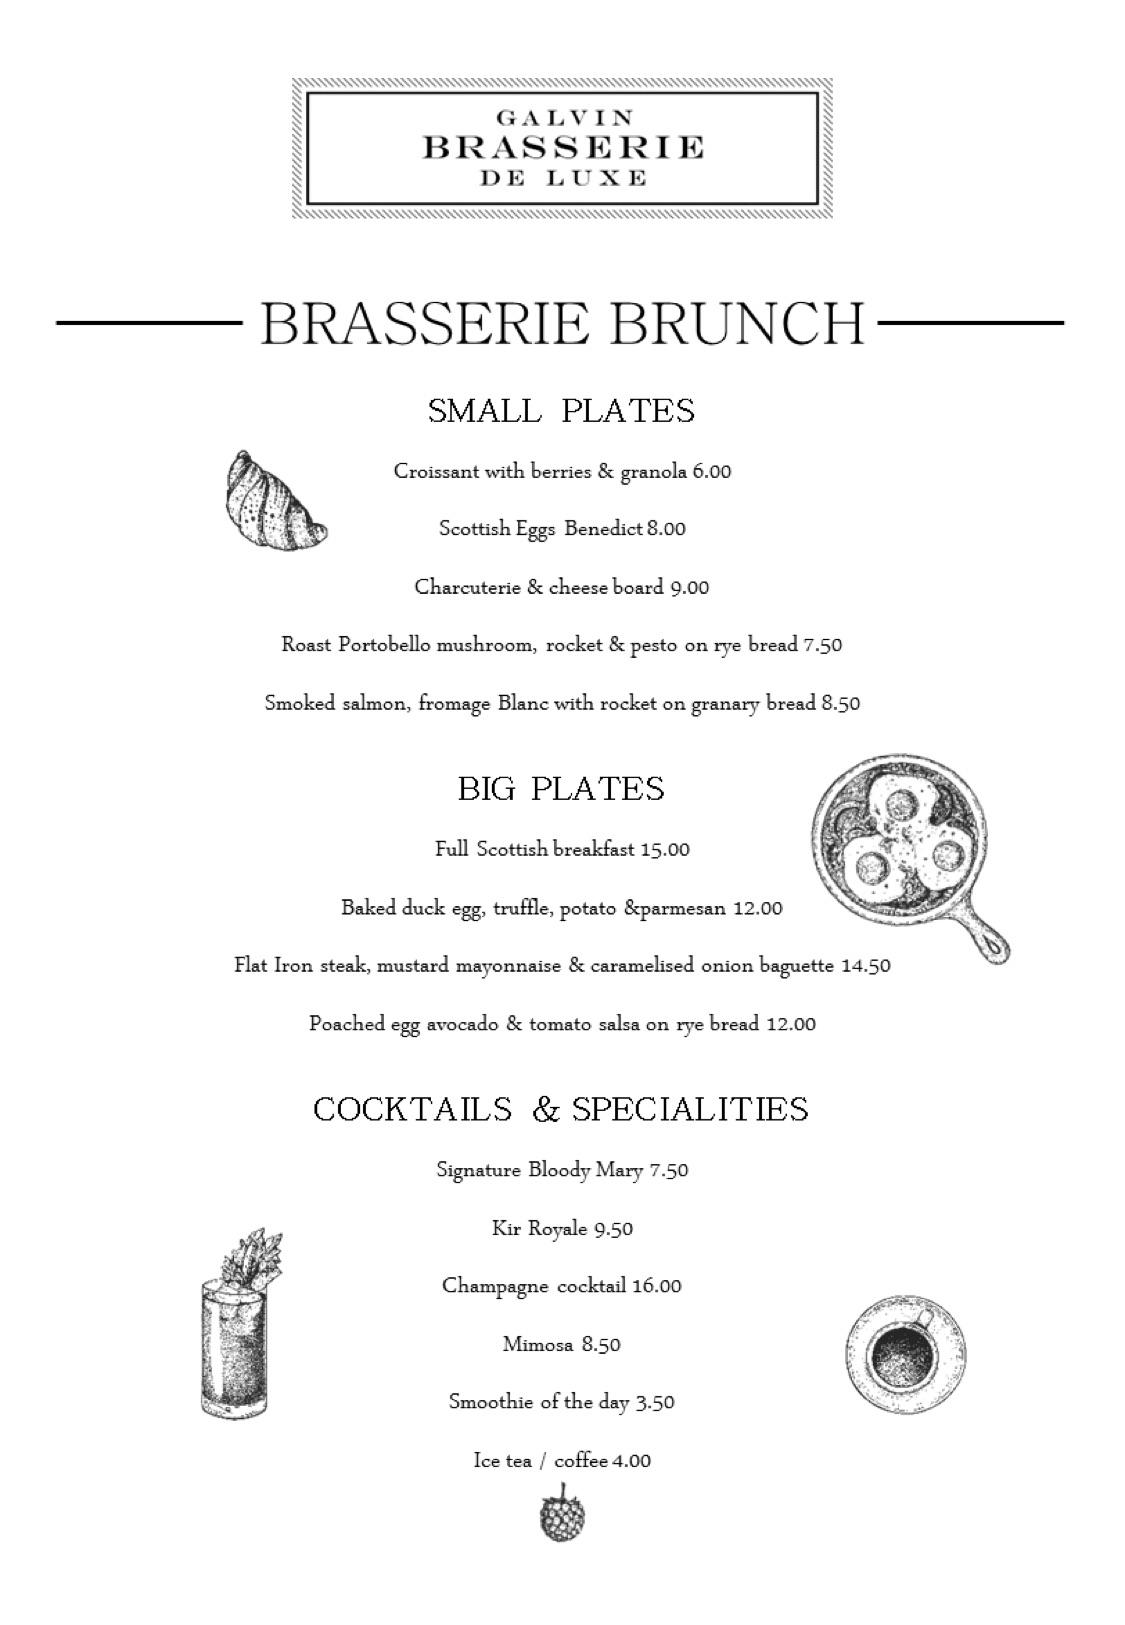 Galvin brasserie brunch weekend food edinburgh